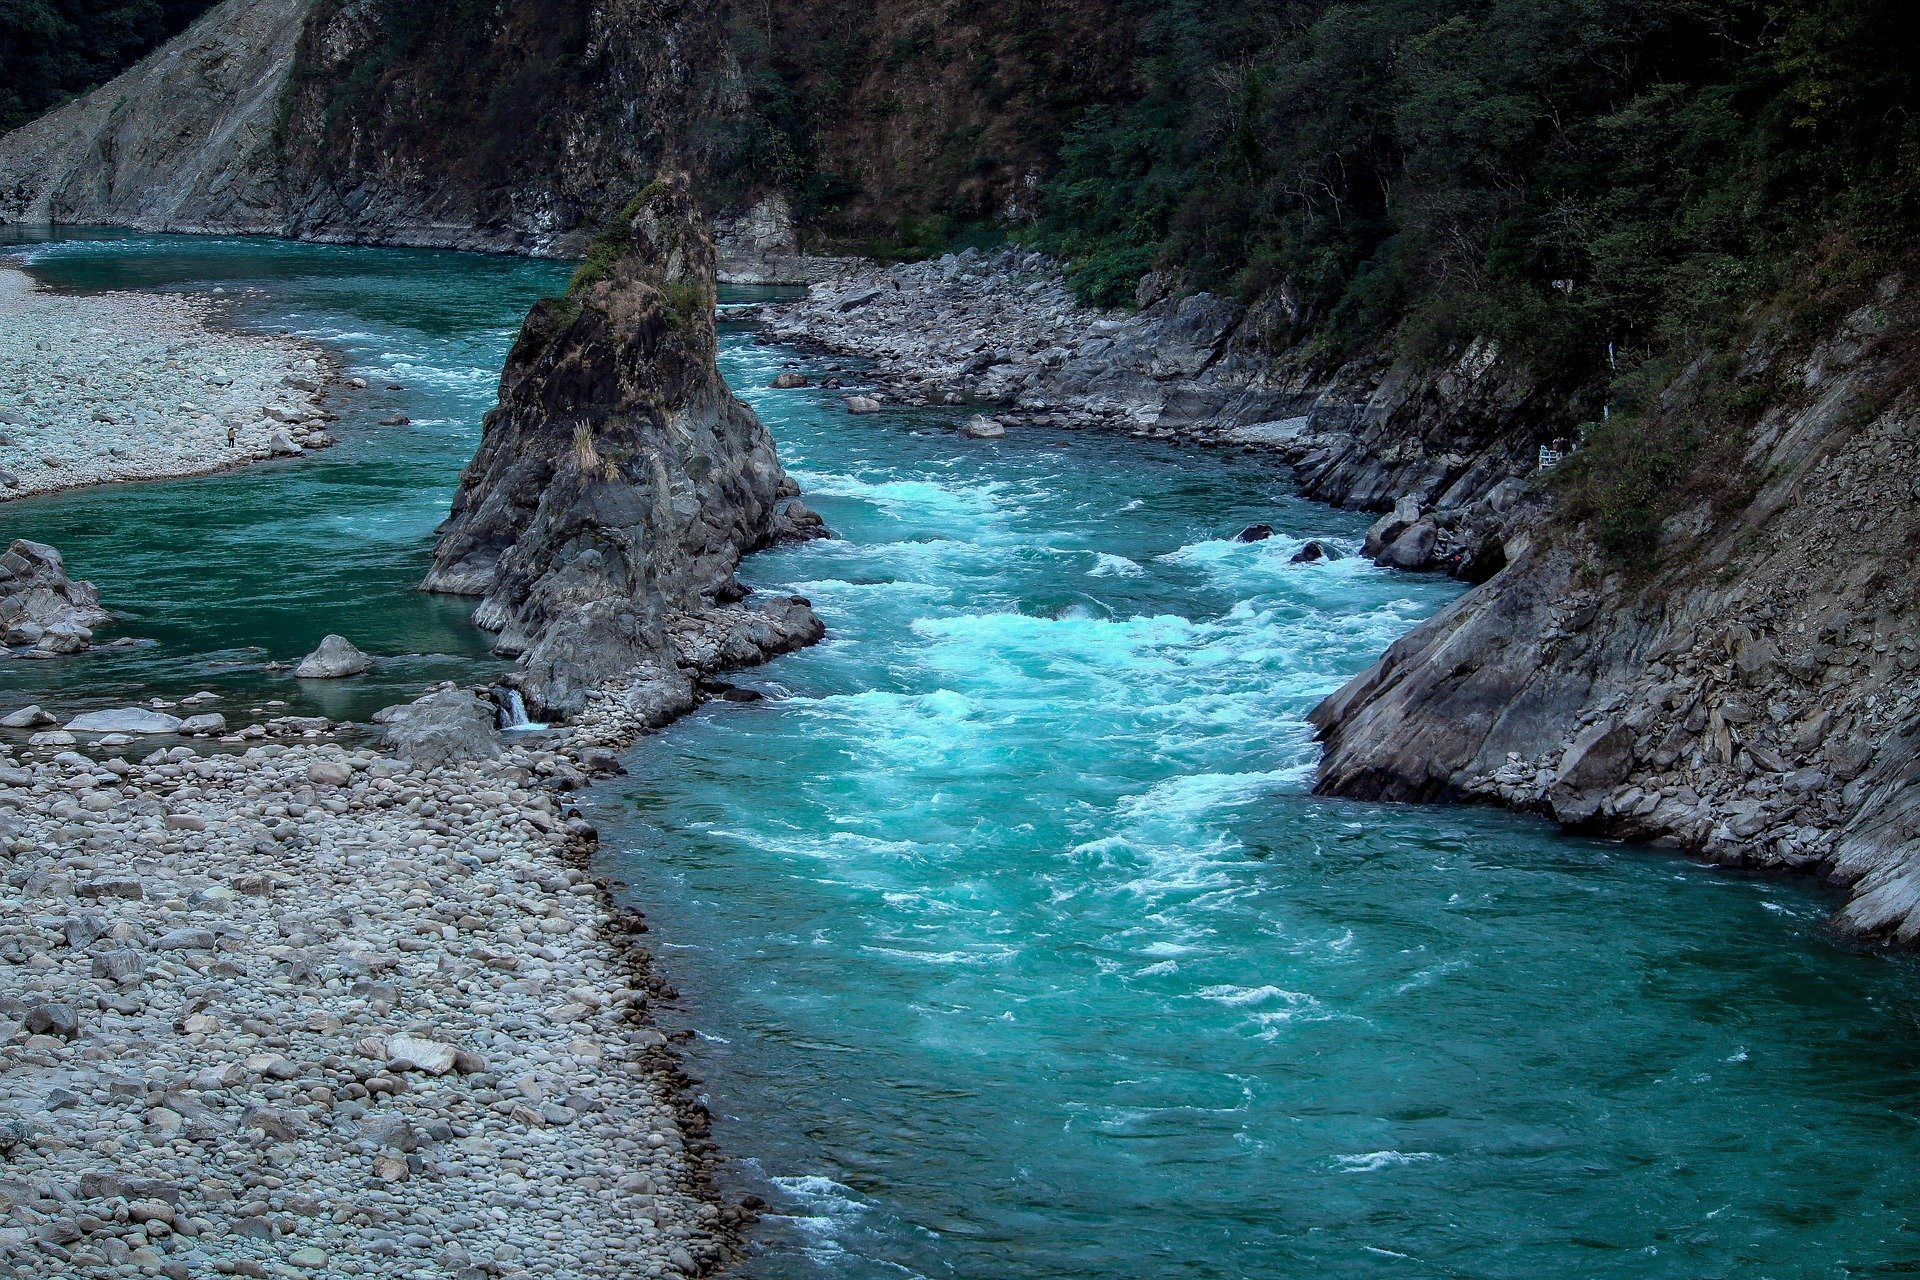 10 Best Places to visit in Arunachal Pradesh 2020 - Top ...